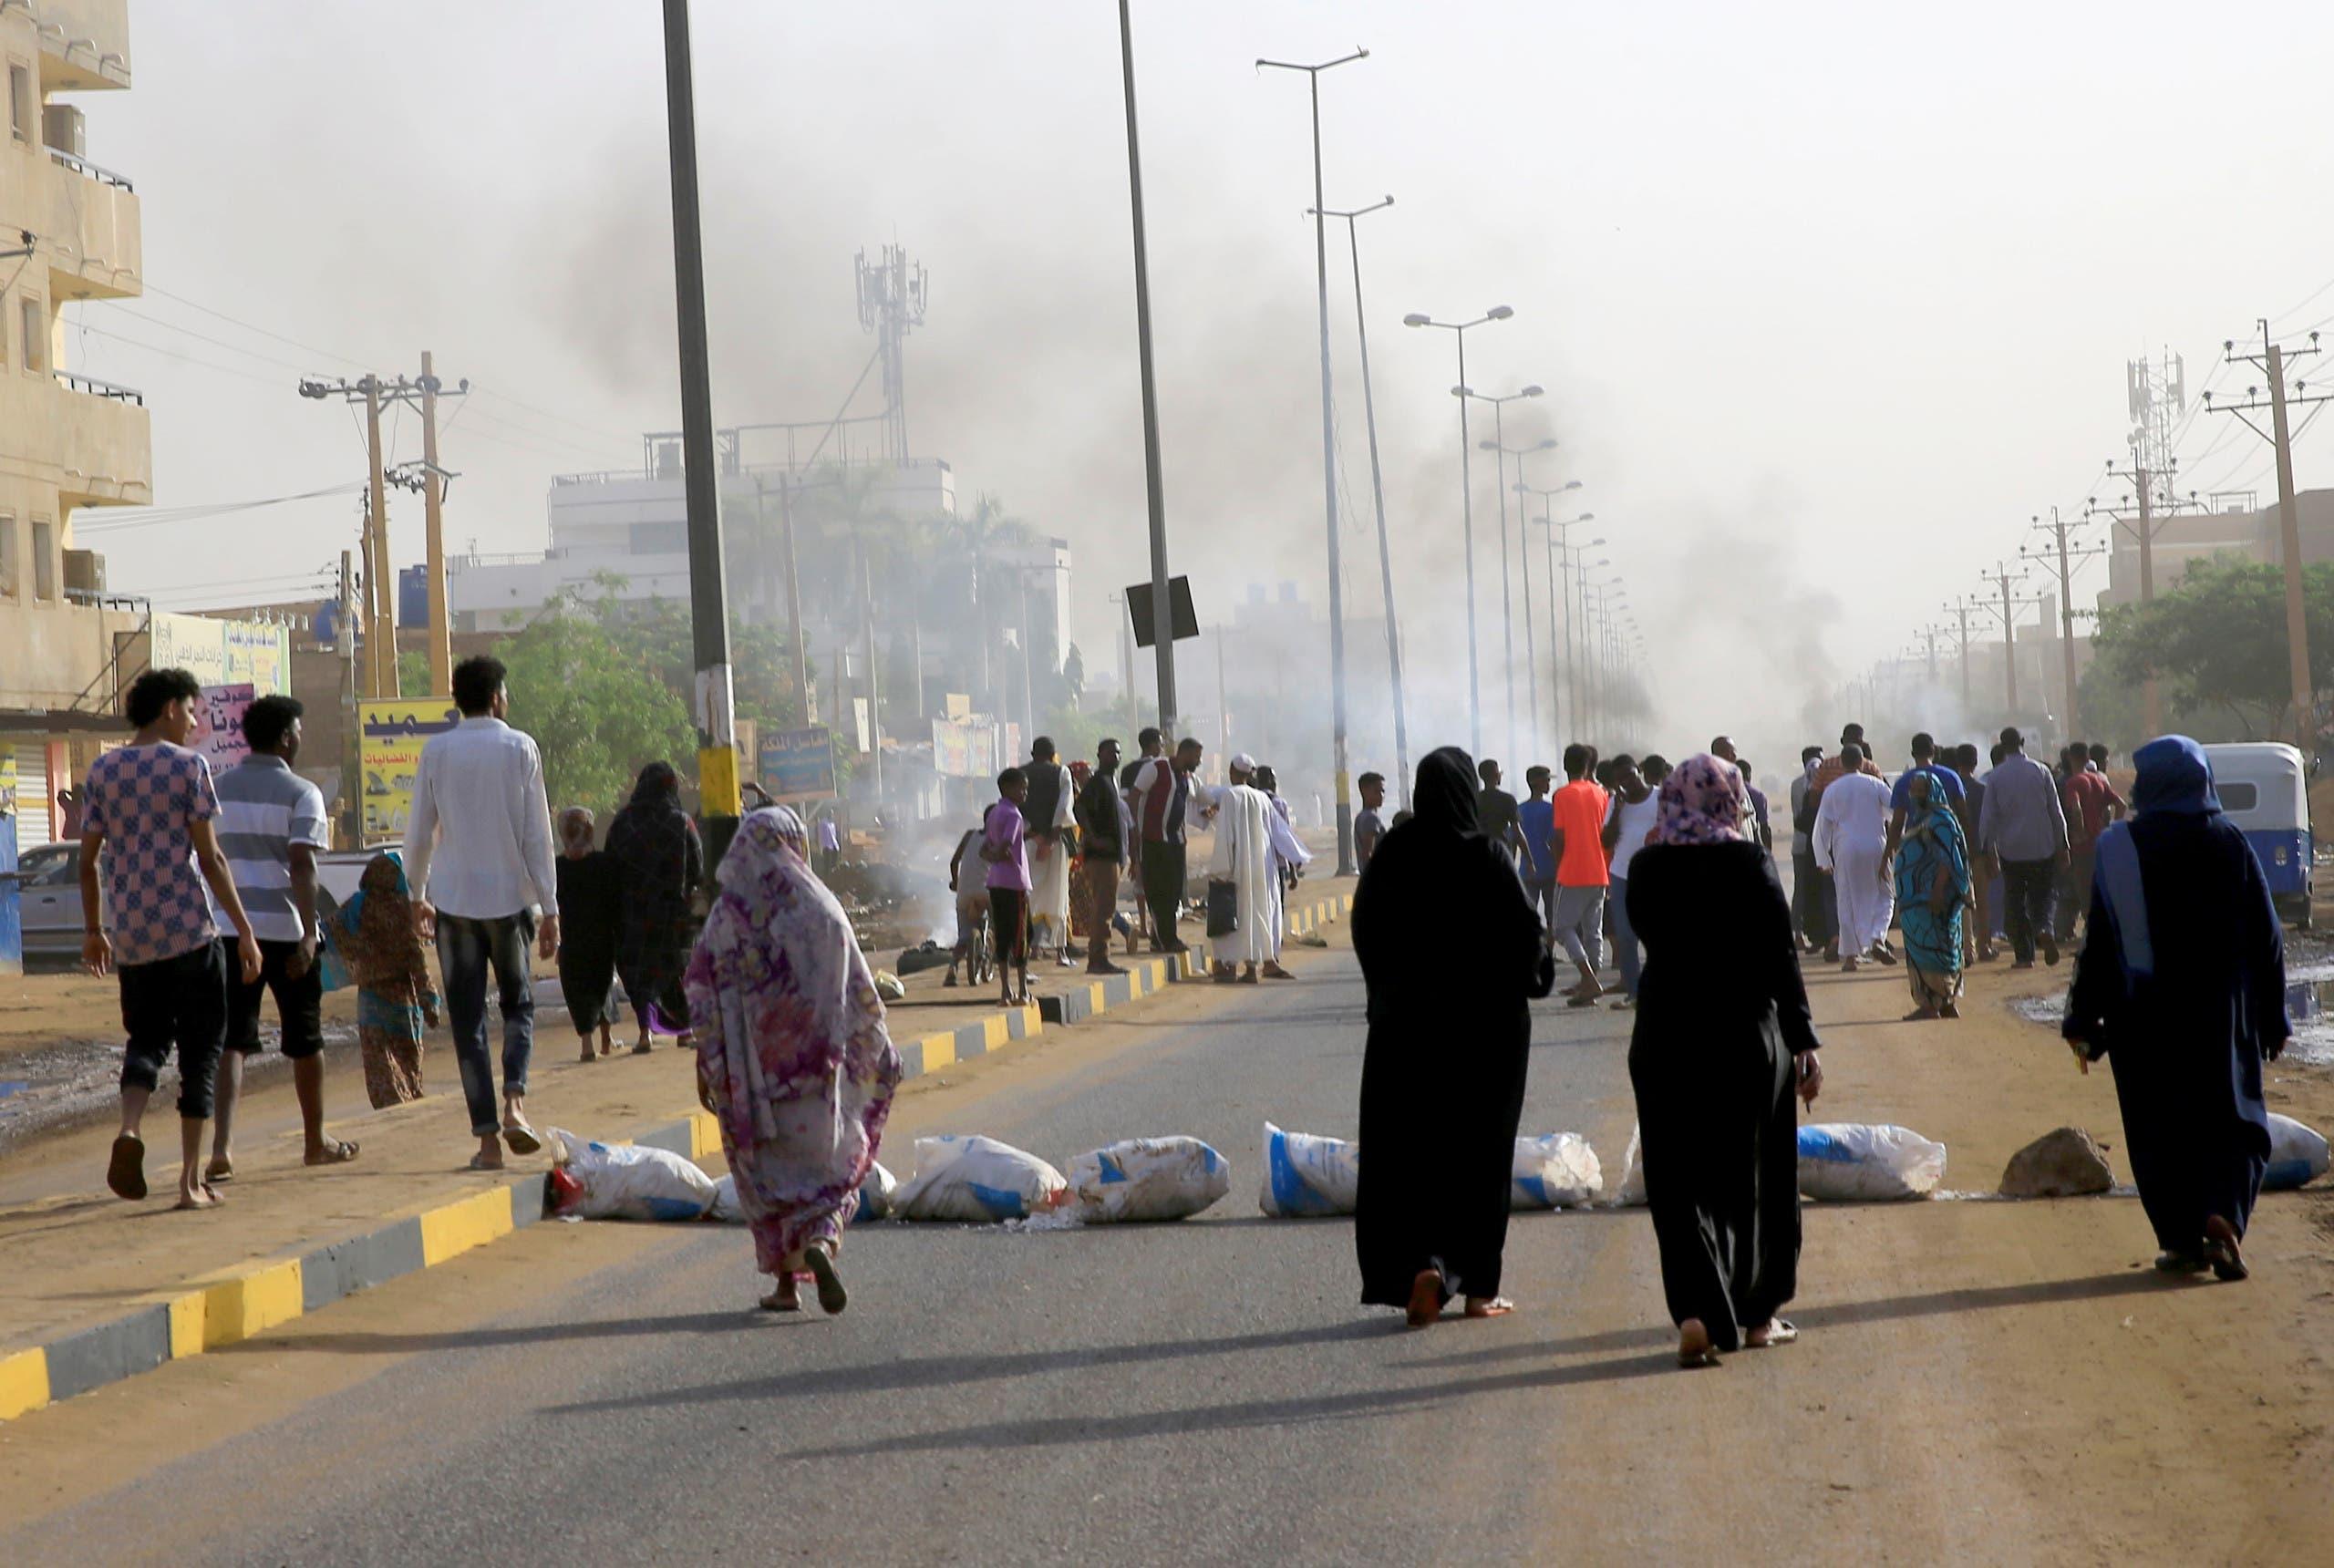 From June 3, 2019 sit-in strike in Khartoum (archive)